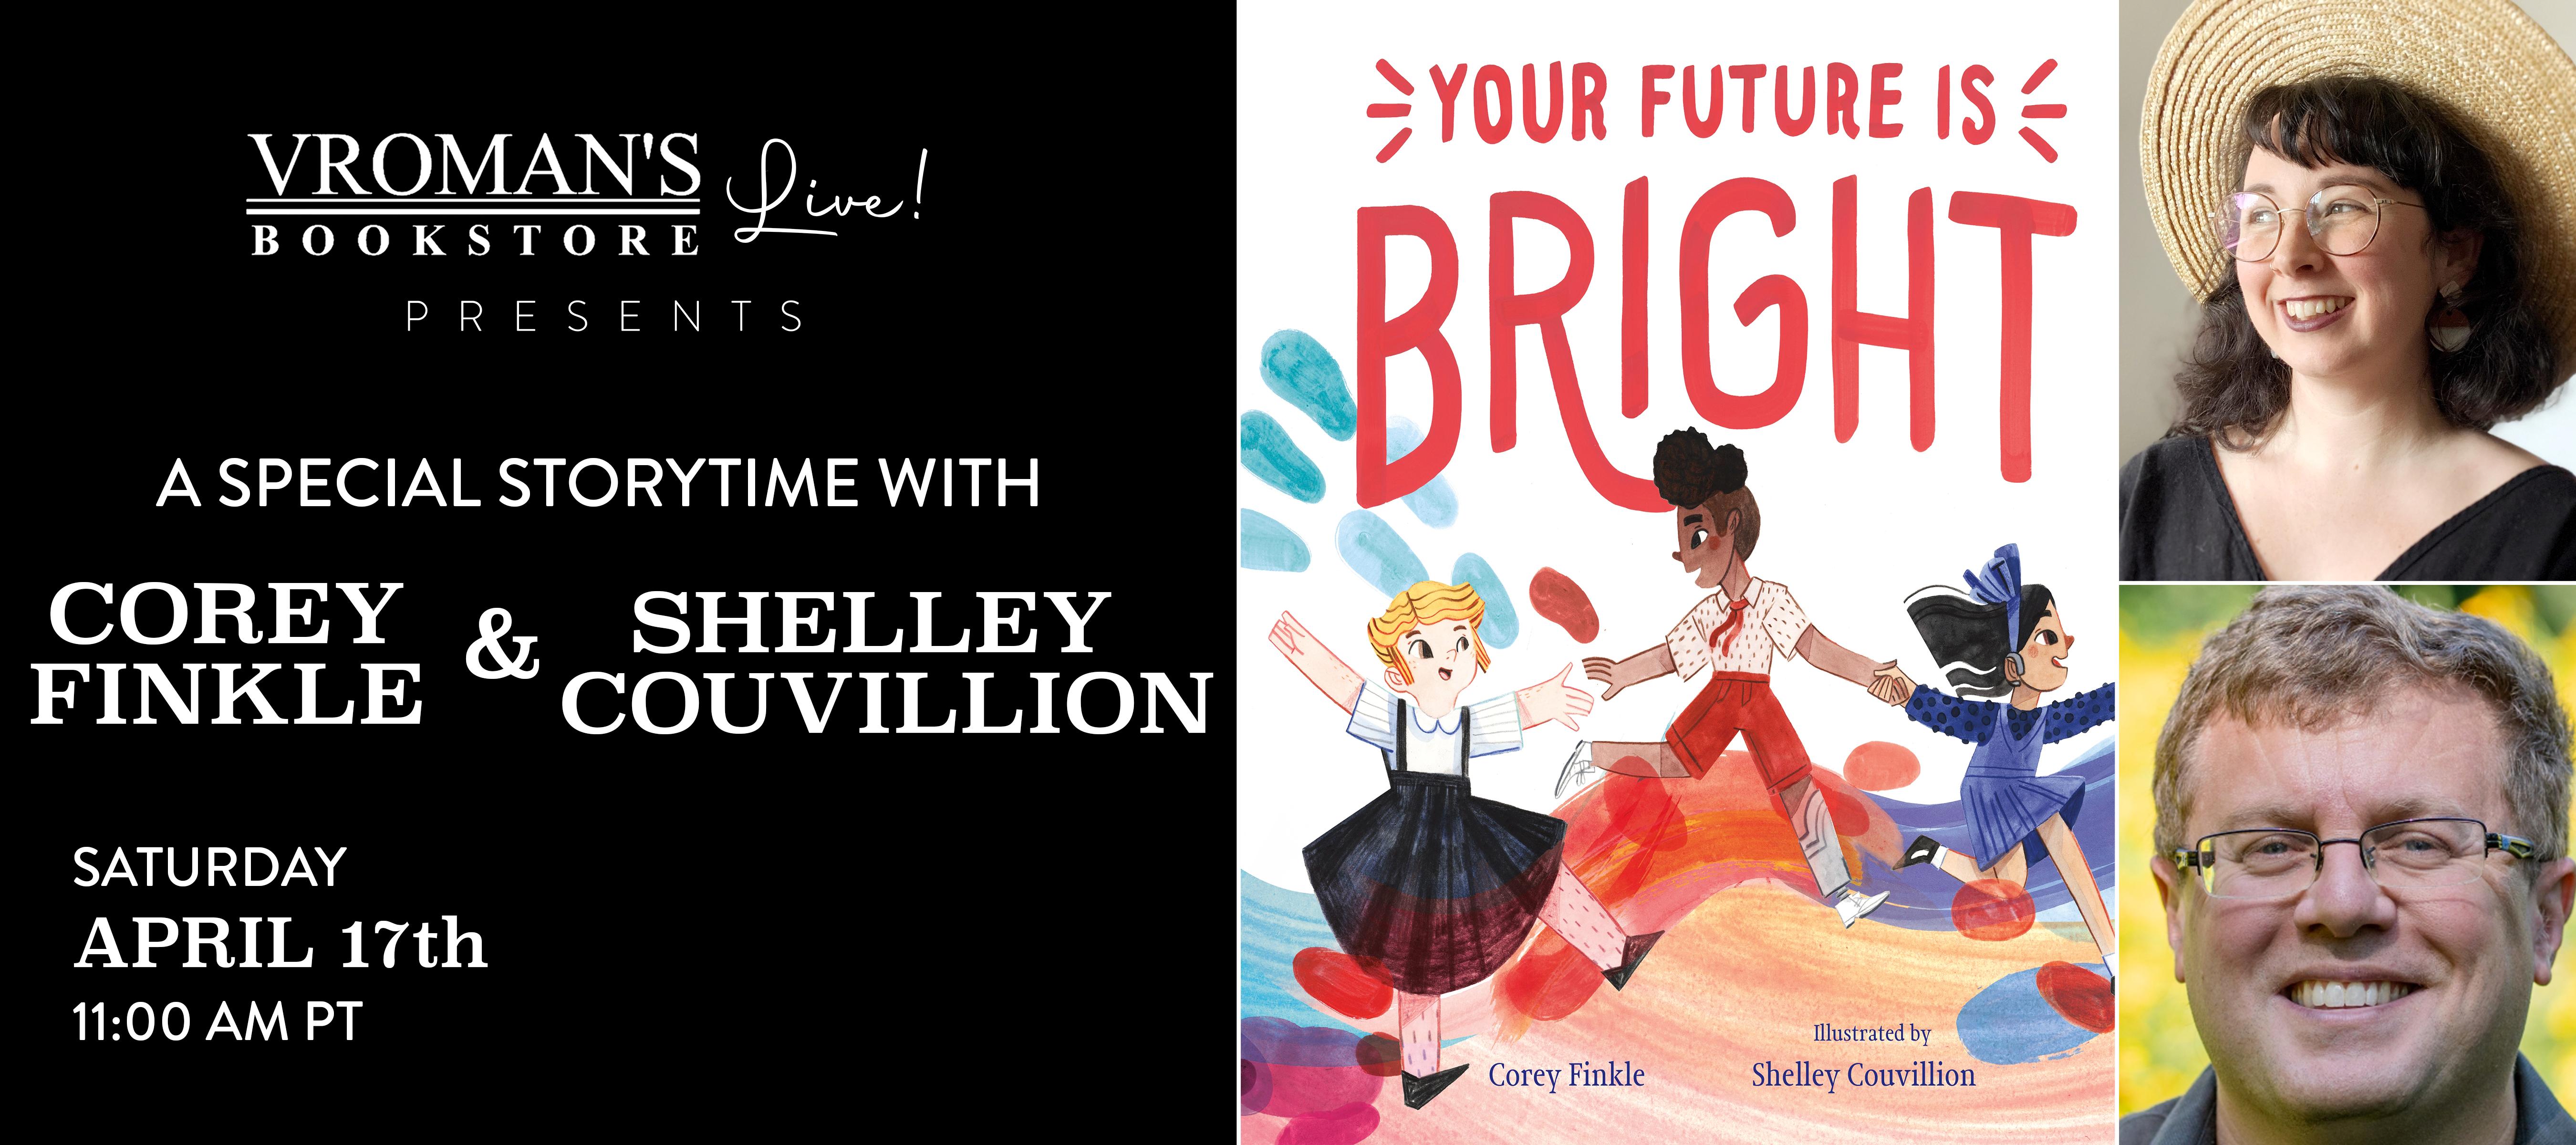 Corey Finkle & Shelley Couvillion on Saturday April 17 at 11am